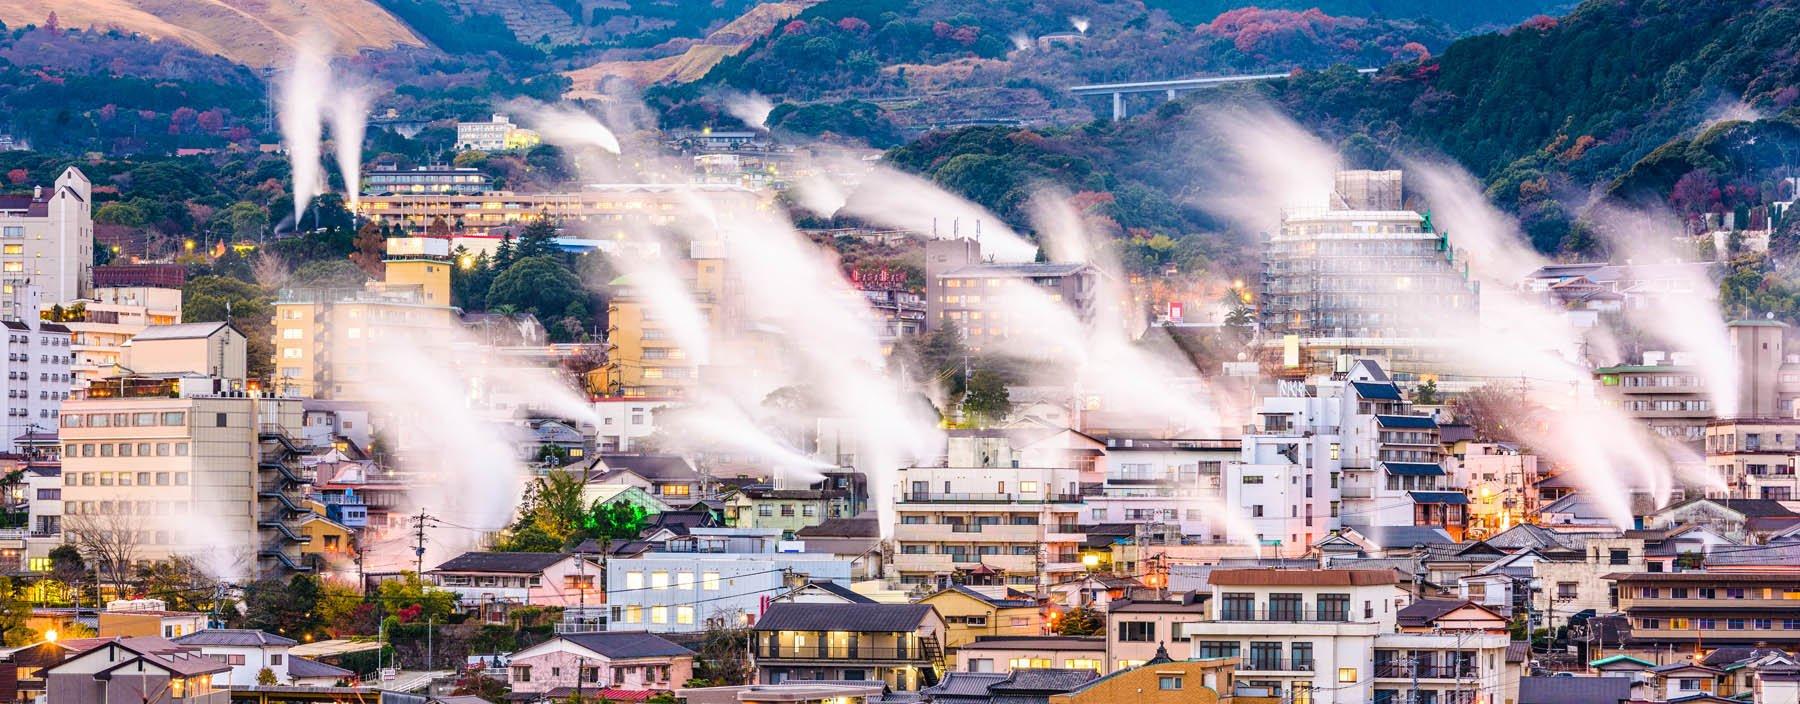 jp, beppu, uitzicht met stoom van hot springs.jpg